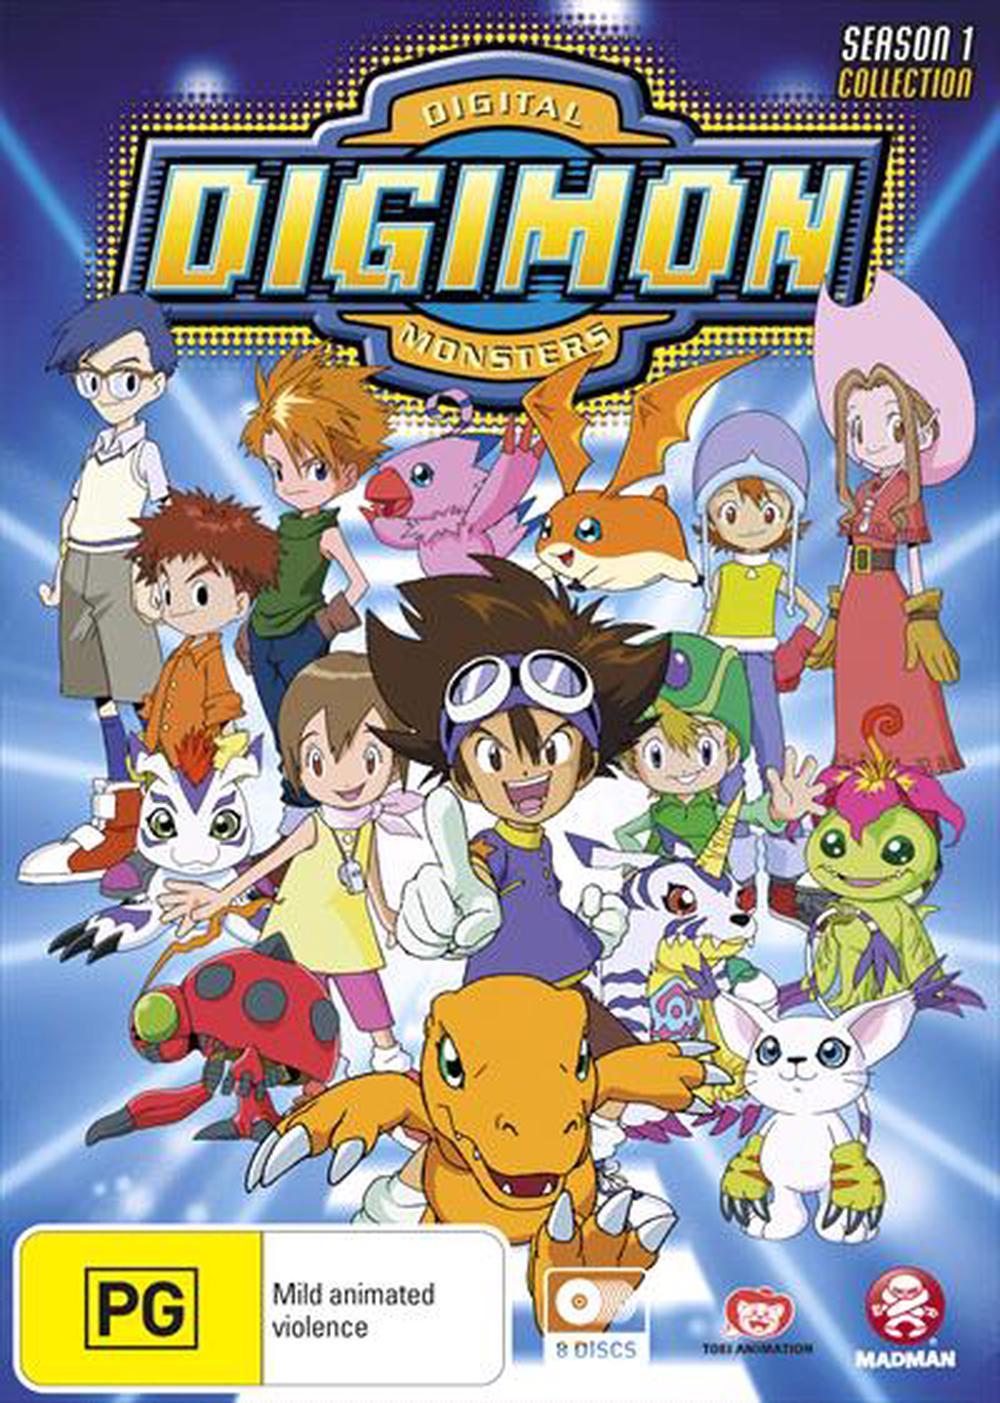 Digimon - Digital Monsters : Season 1